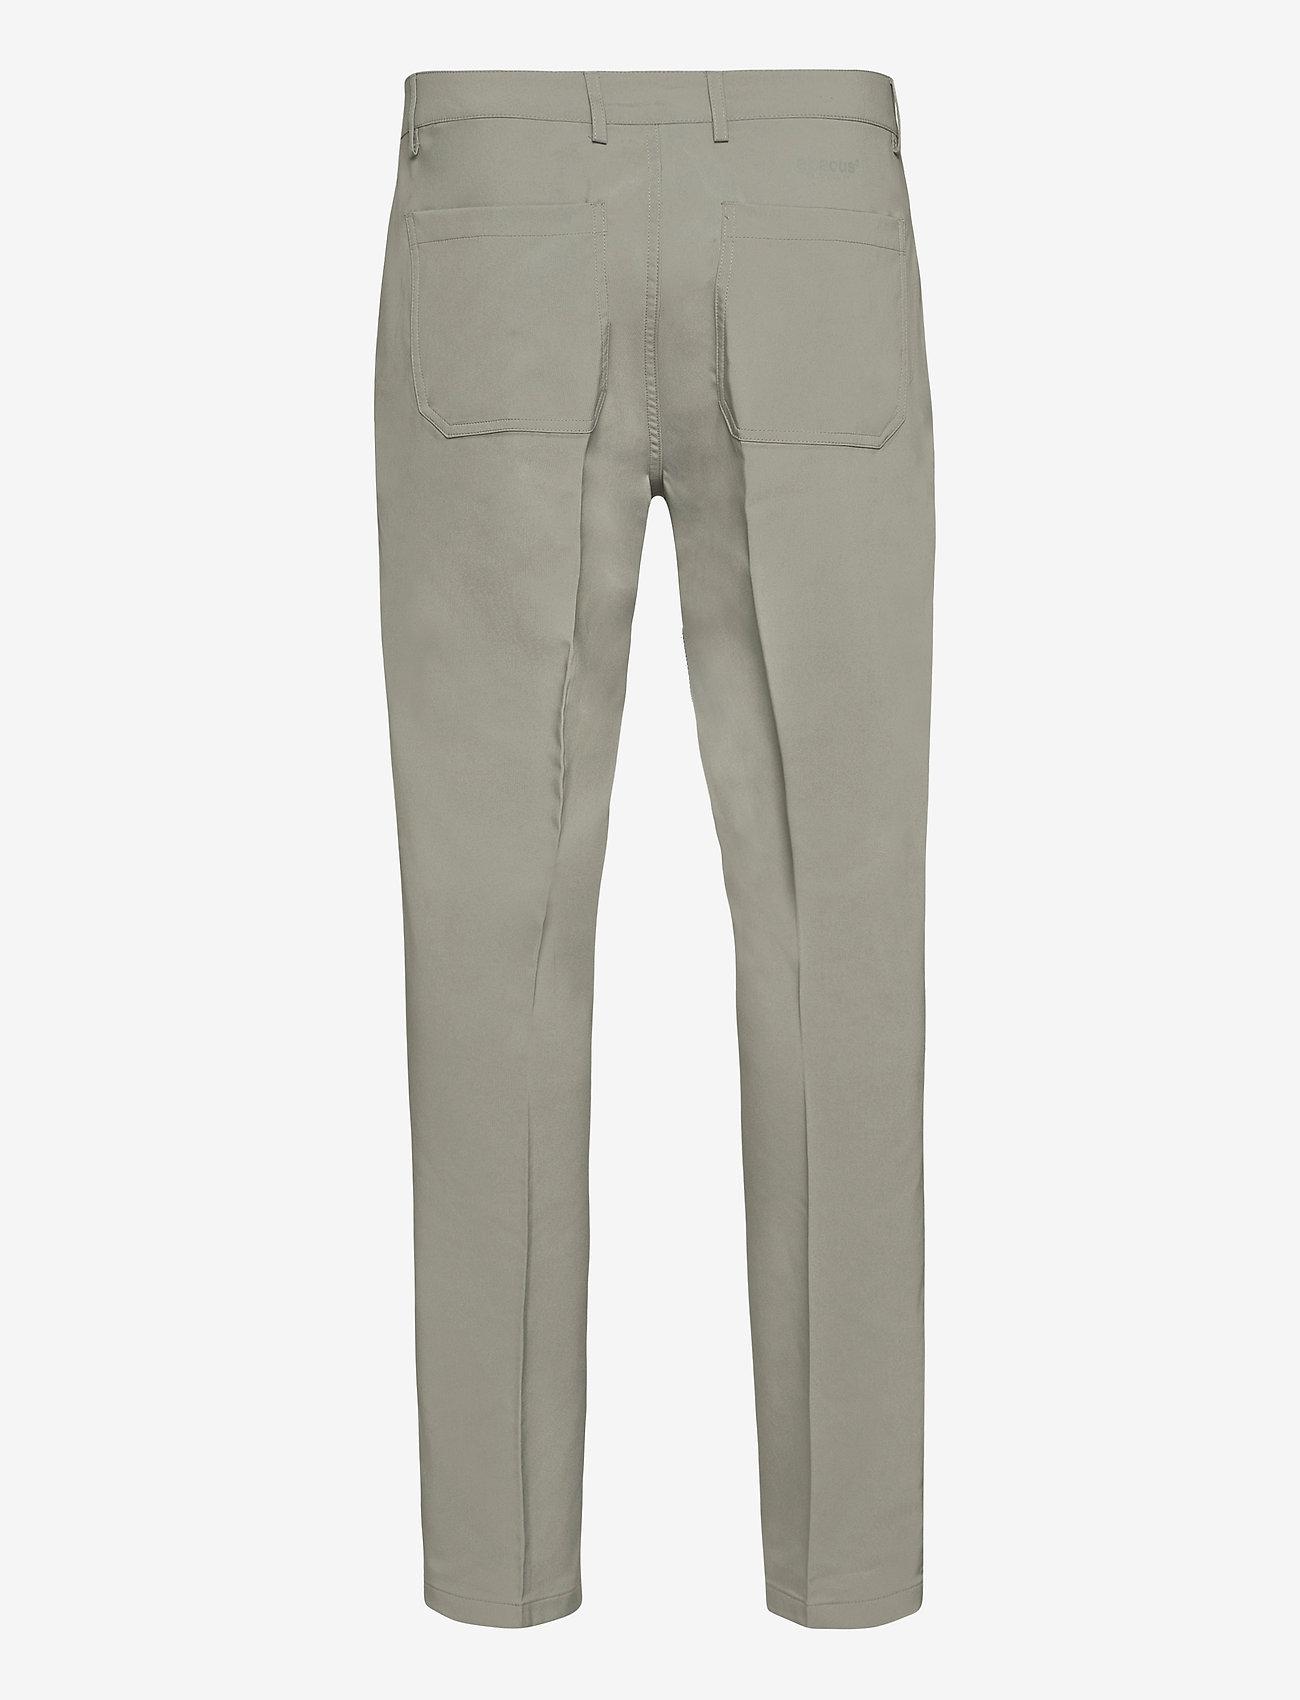 Abacus - Mens Cleek stretch trousers - golf-housut - grey - 1